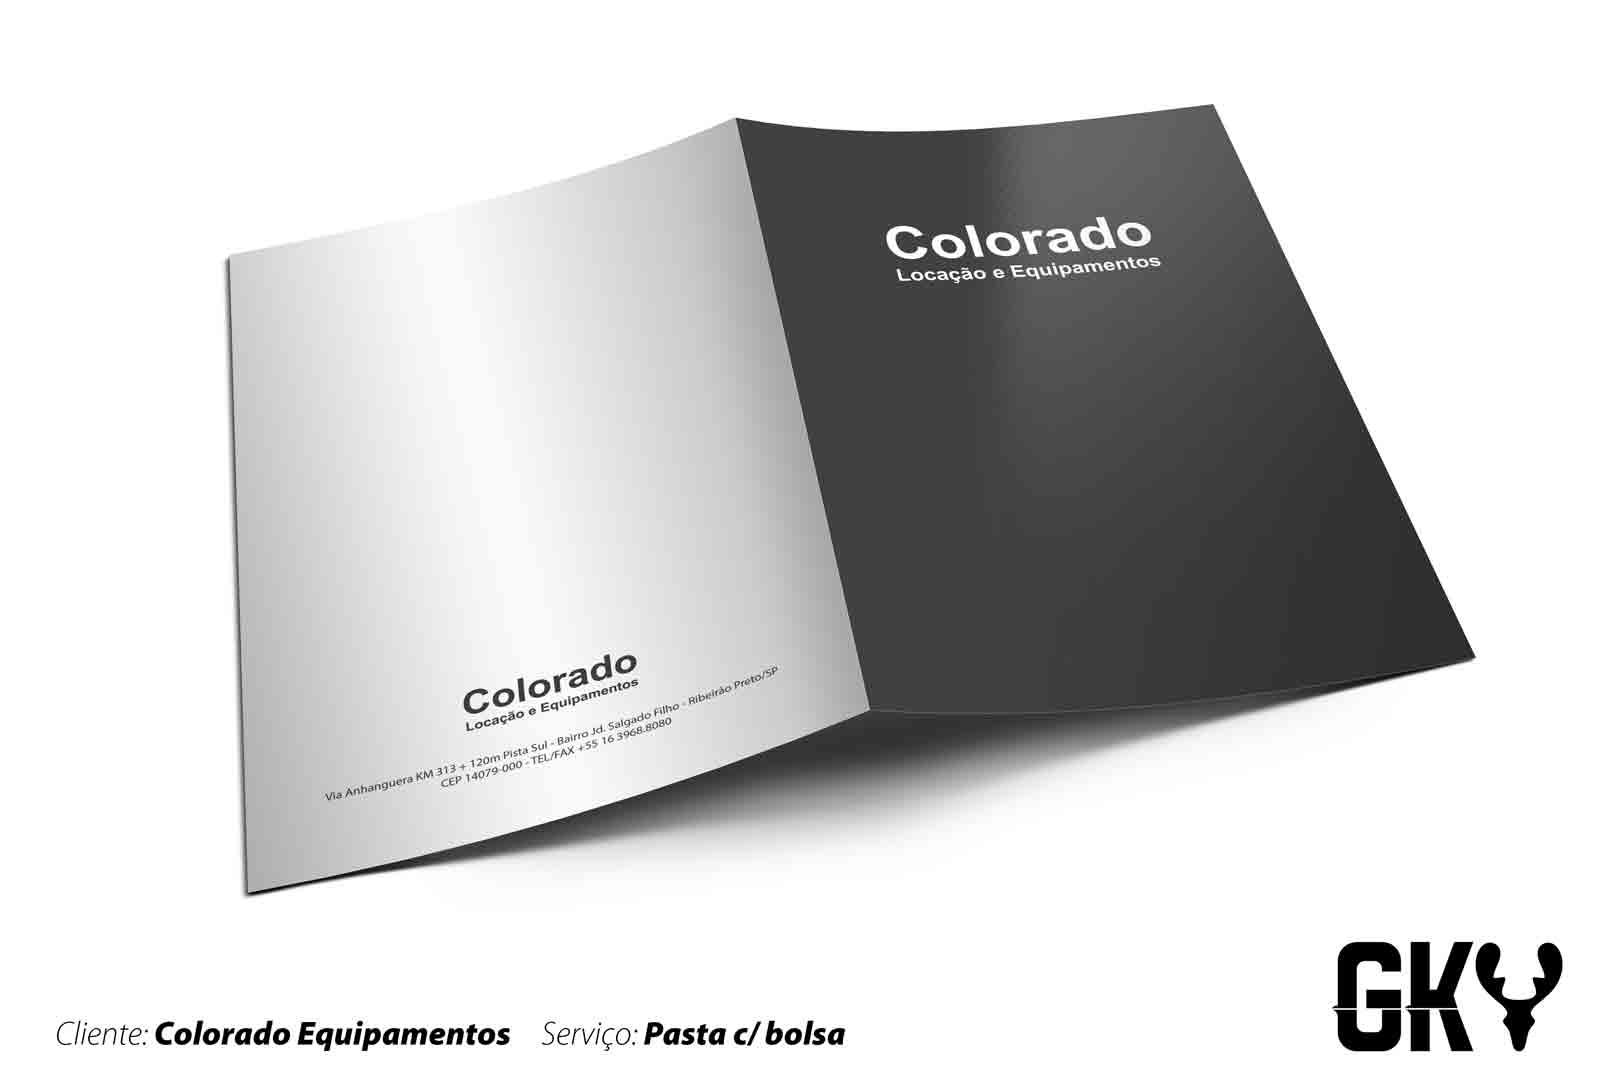 John Deere - Colorado